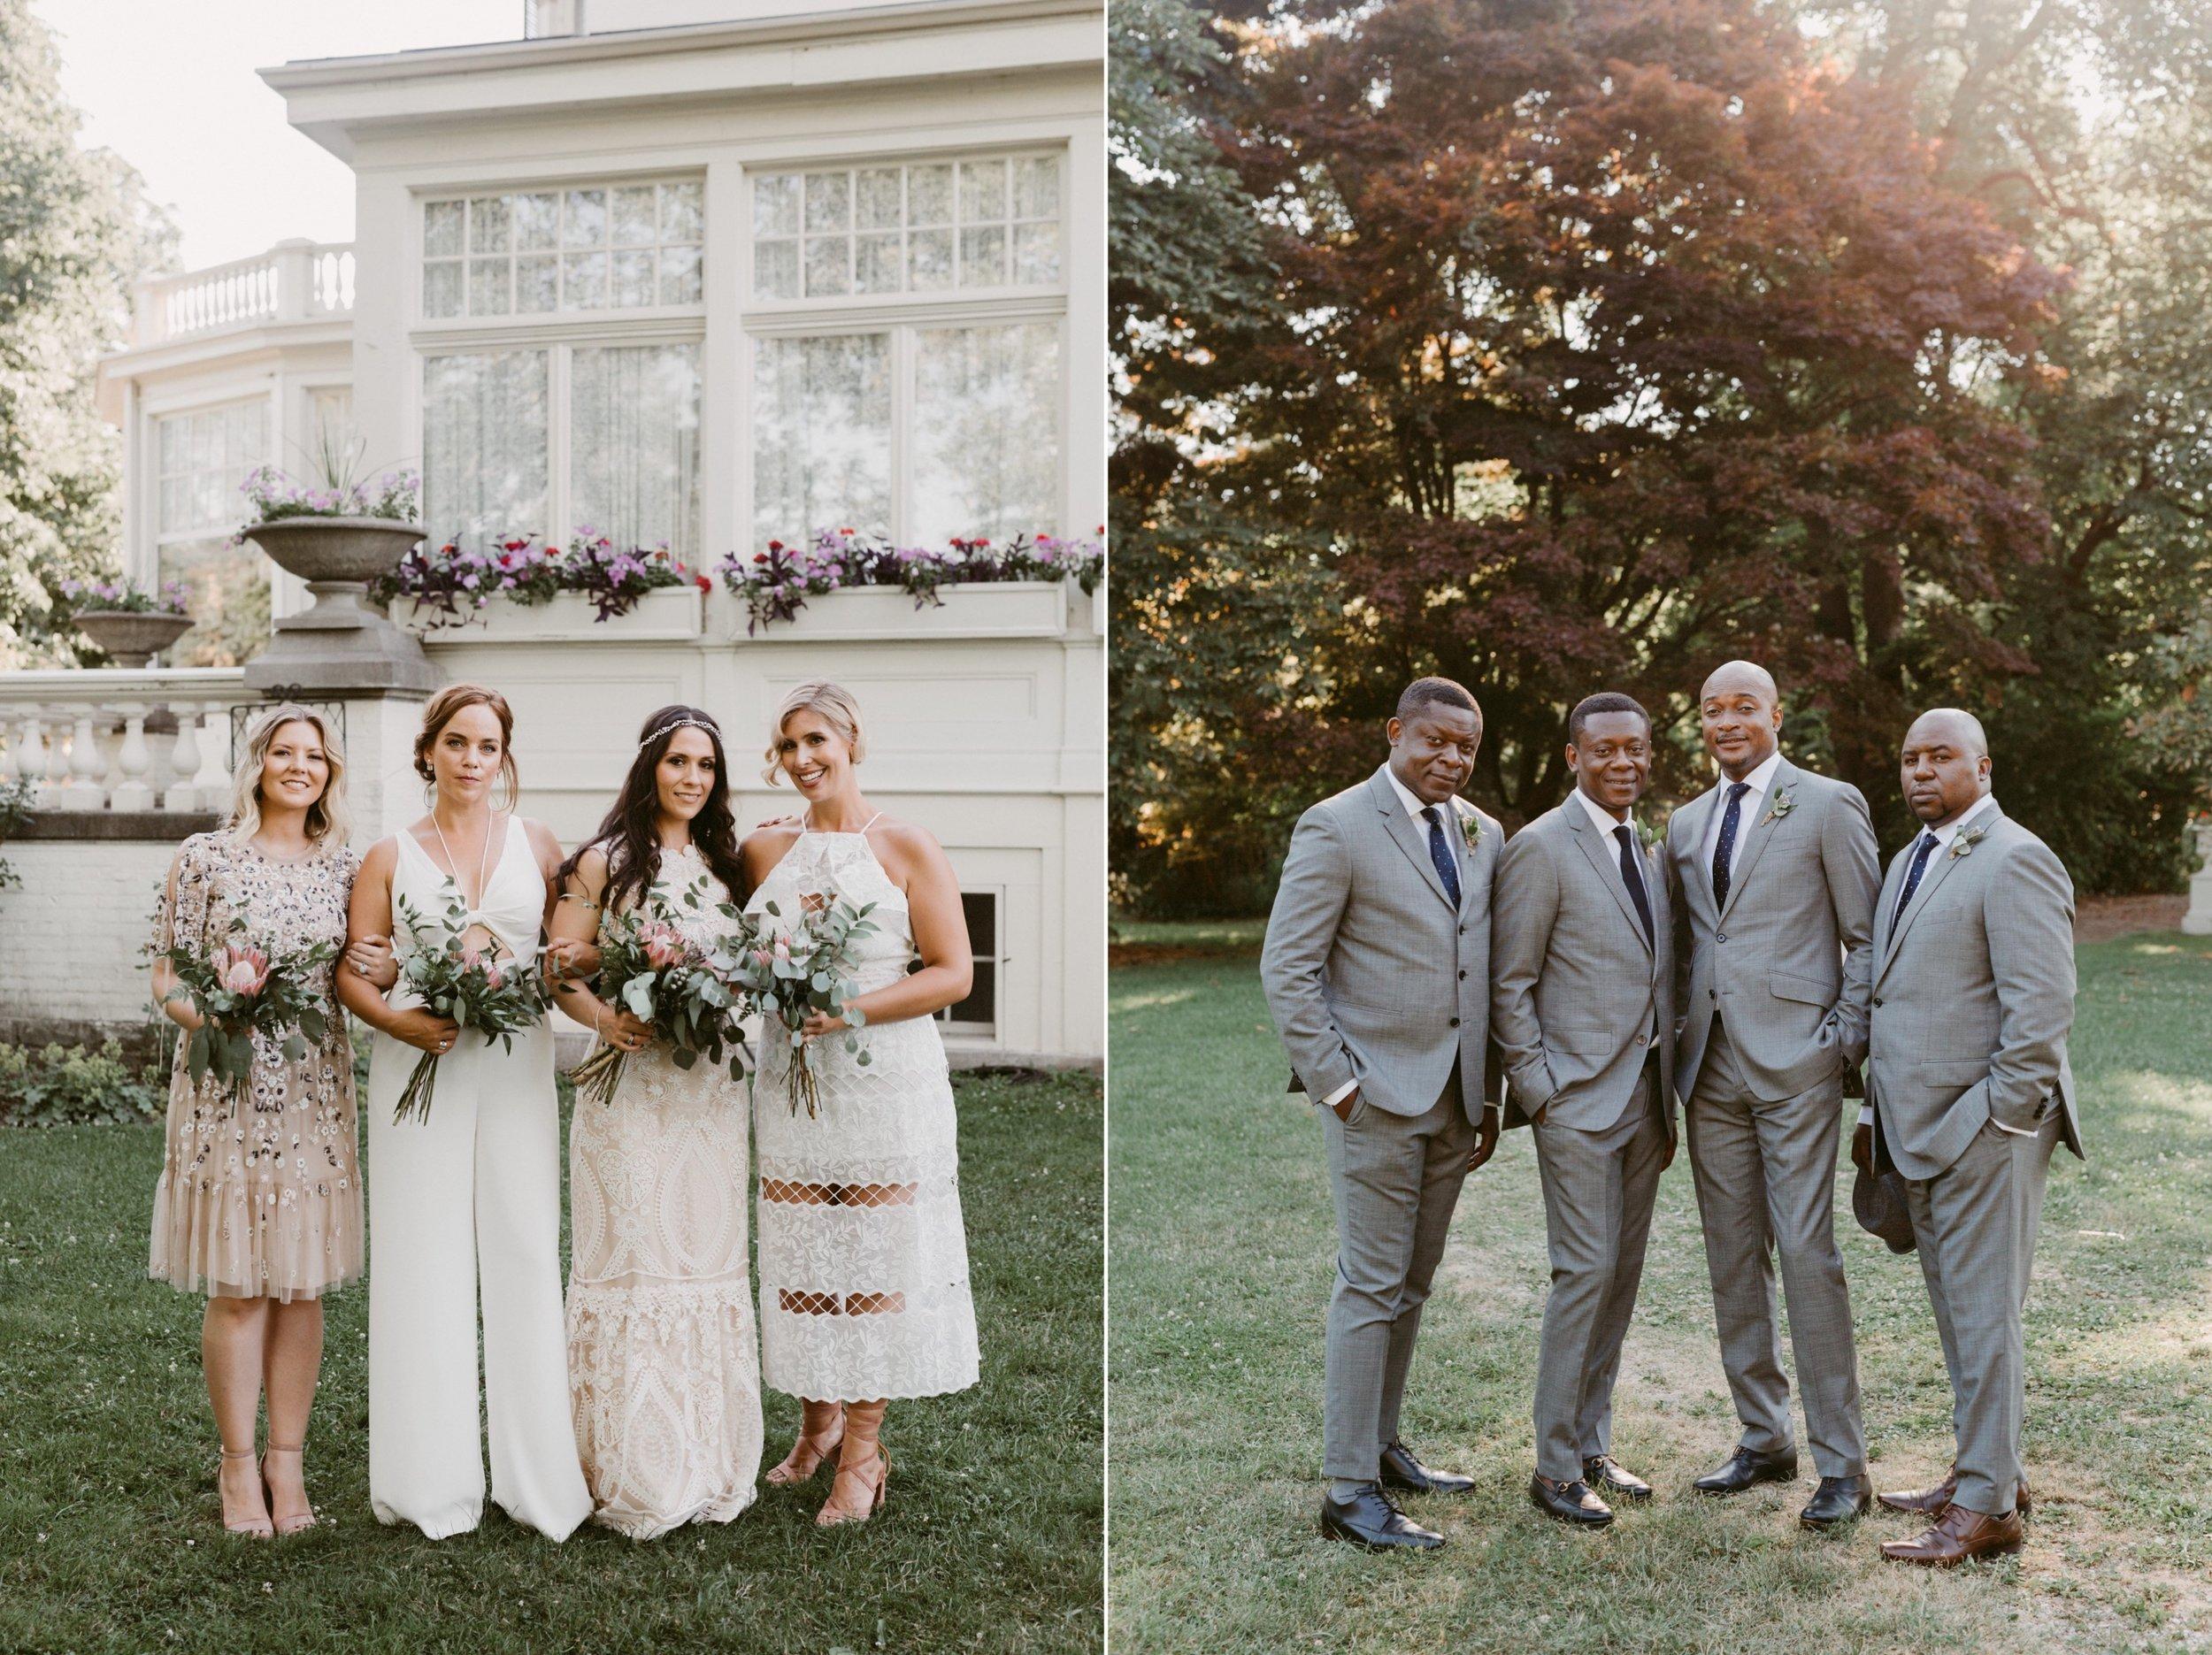 043_Spadina House Wedding (279 of 748)_Spadina House Wedding (288 of 748)_House_Spadina_Wedding_Toronto_intimate.jpg